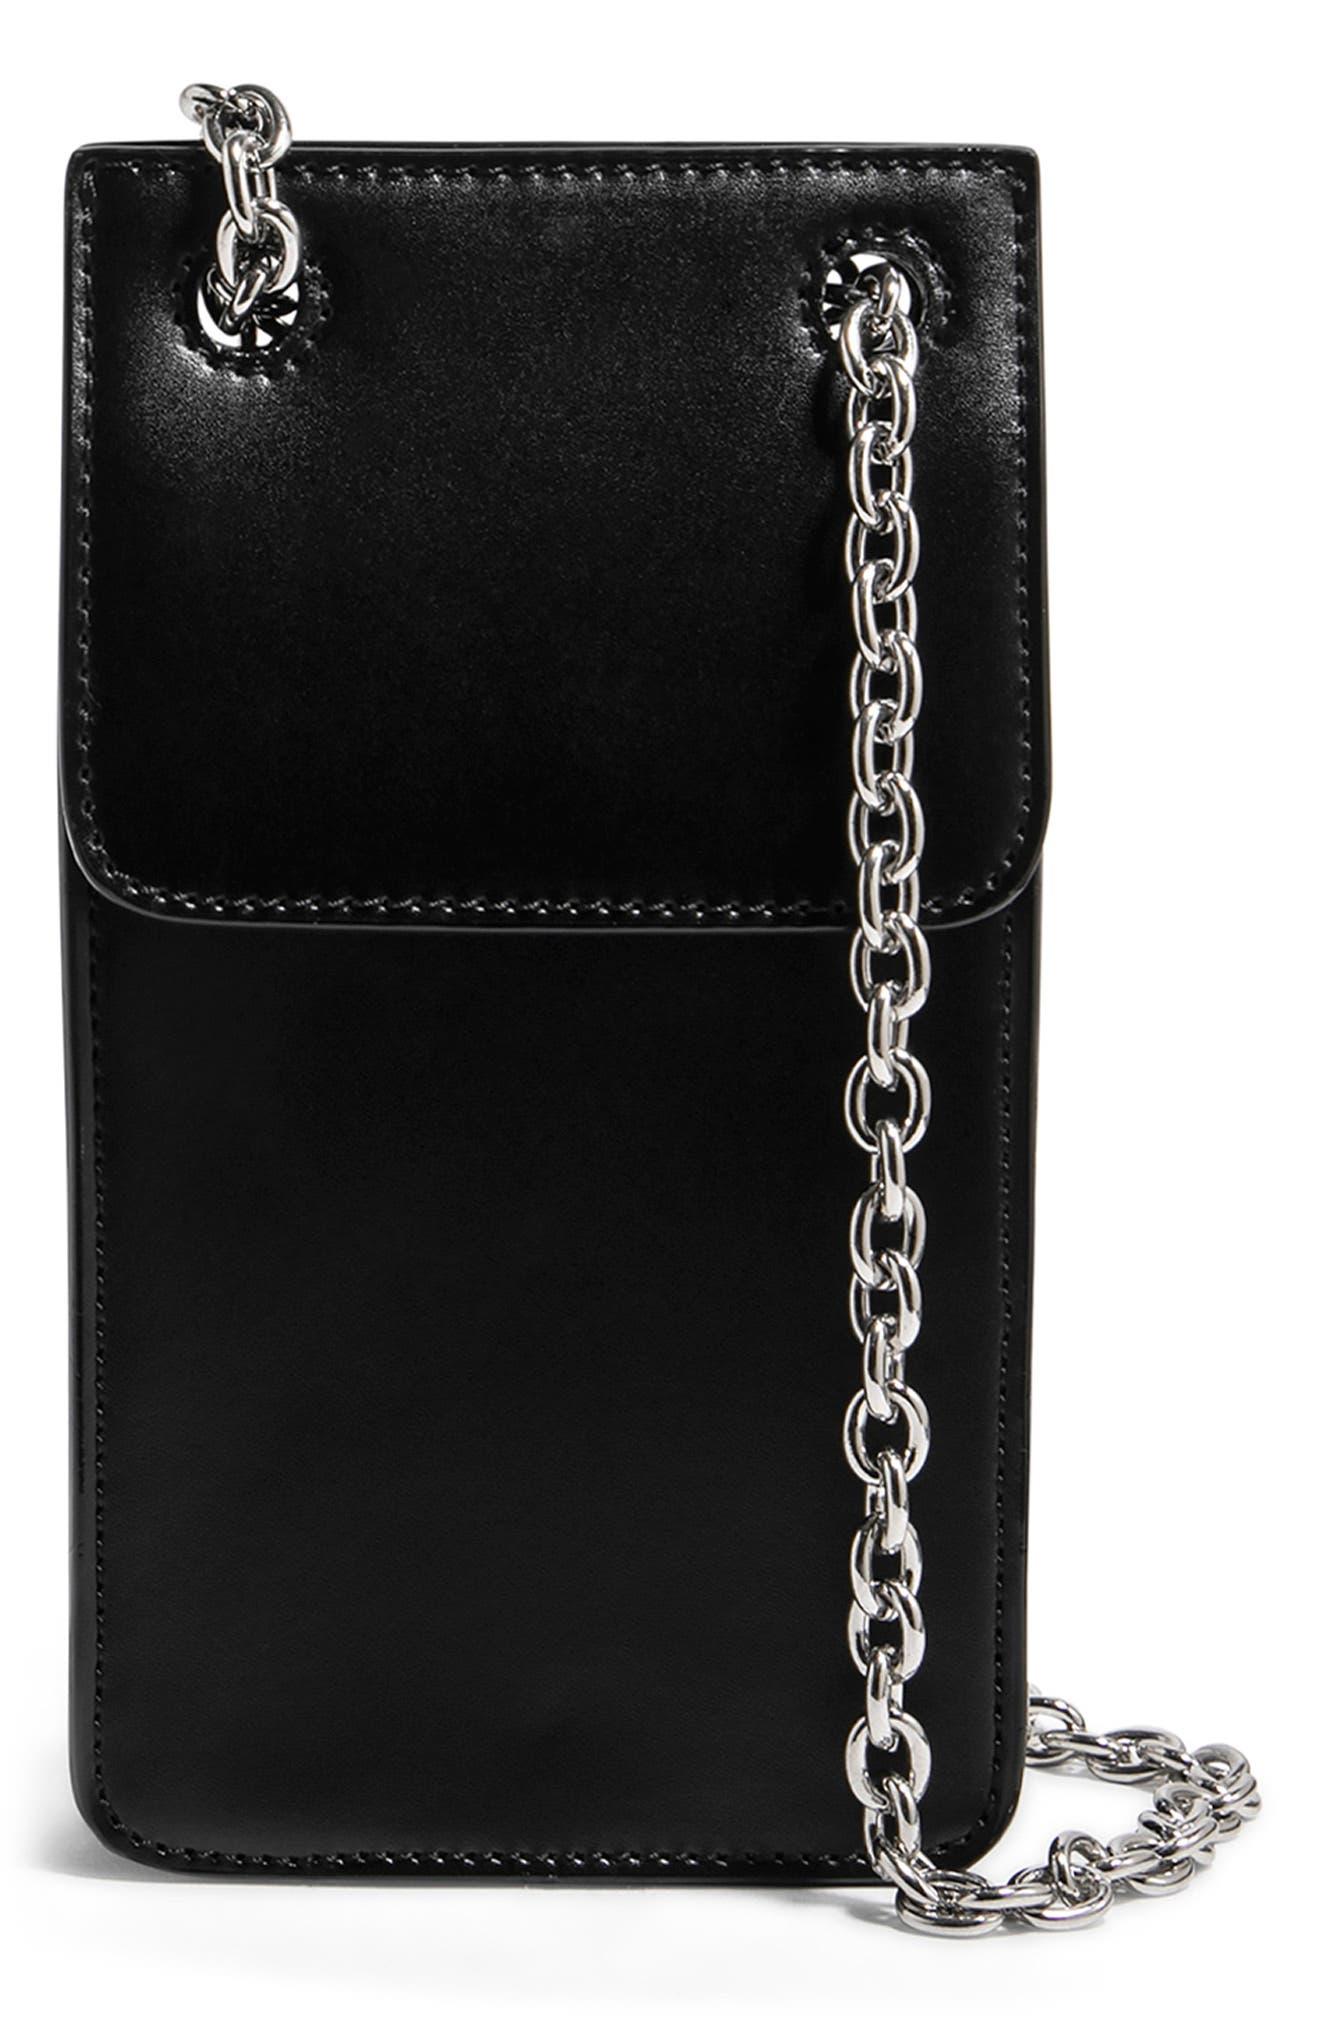 House Of Want Vegan Leather Phone Crossbody Bag - Black